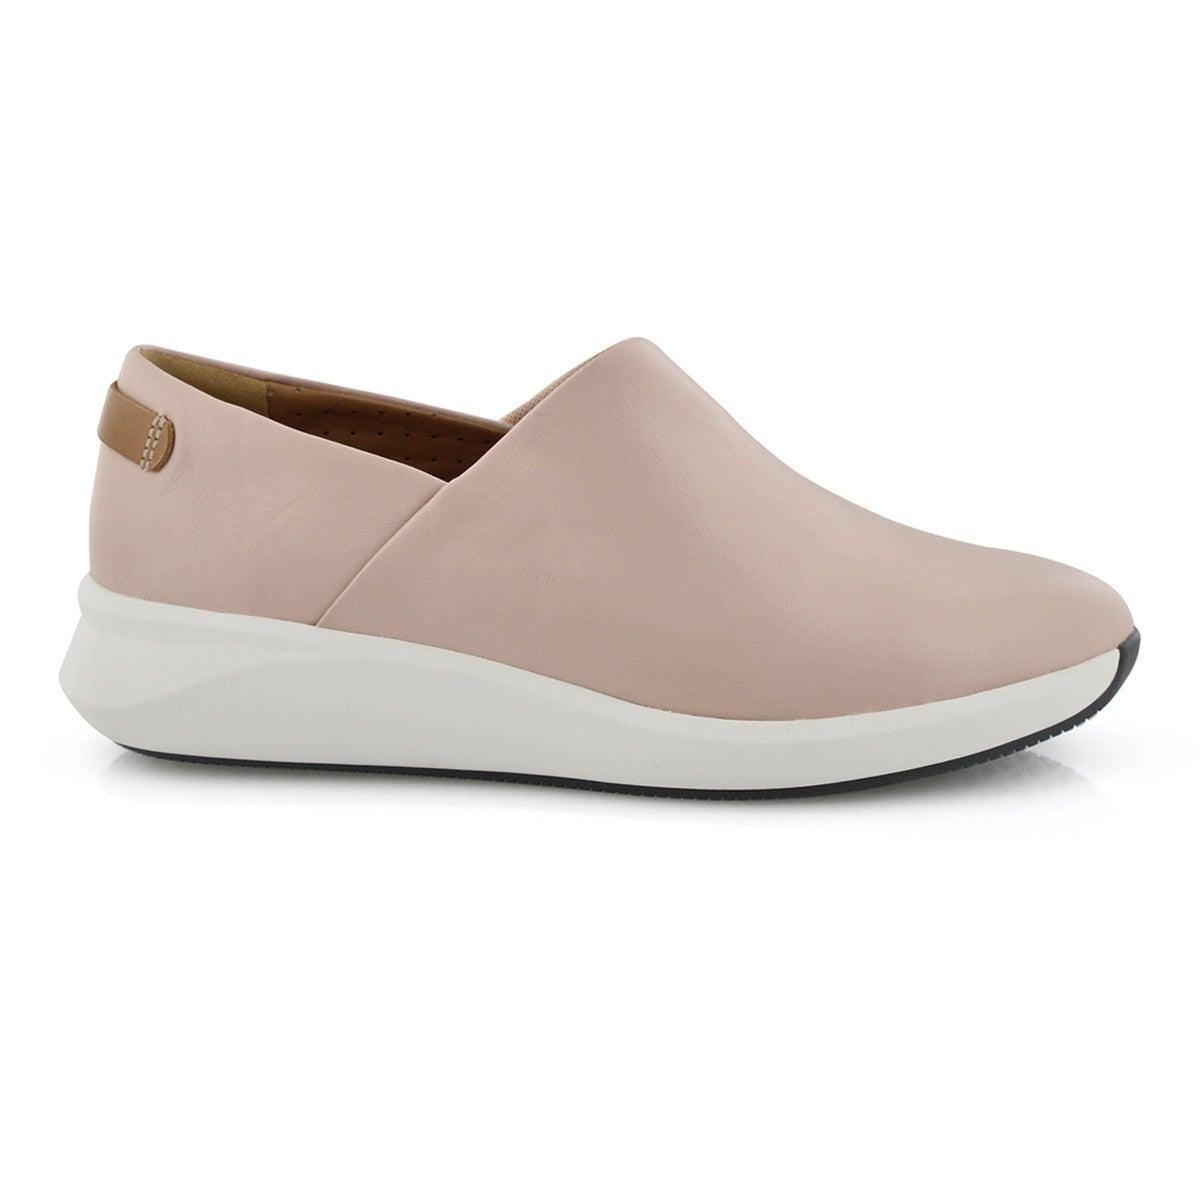 Lds Un Rio Rise nude casual shoe